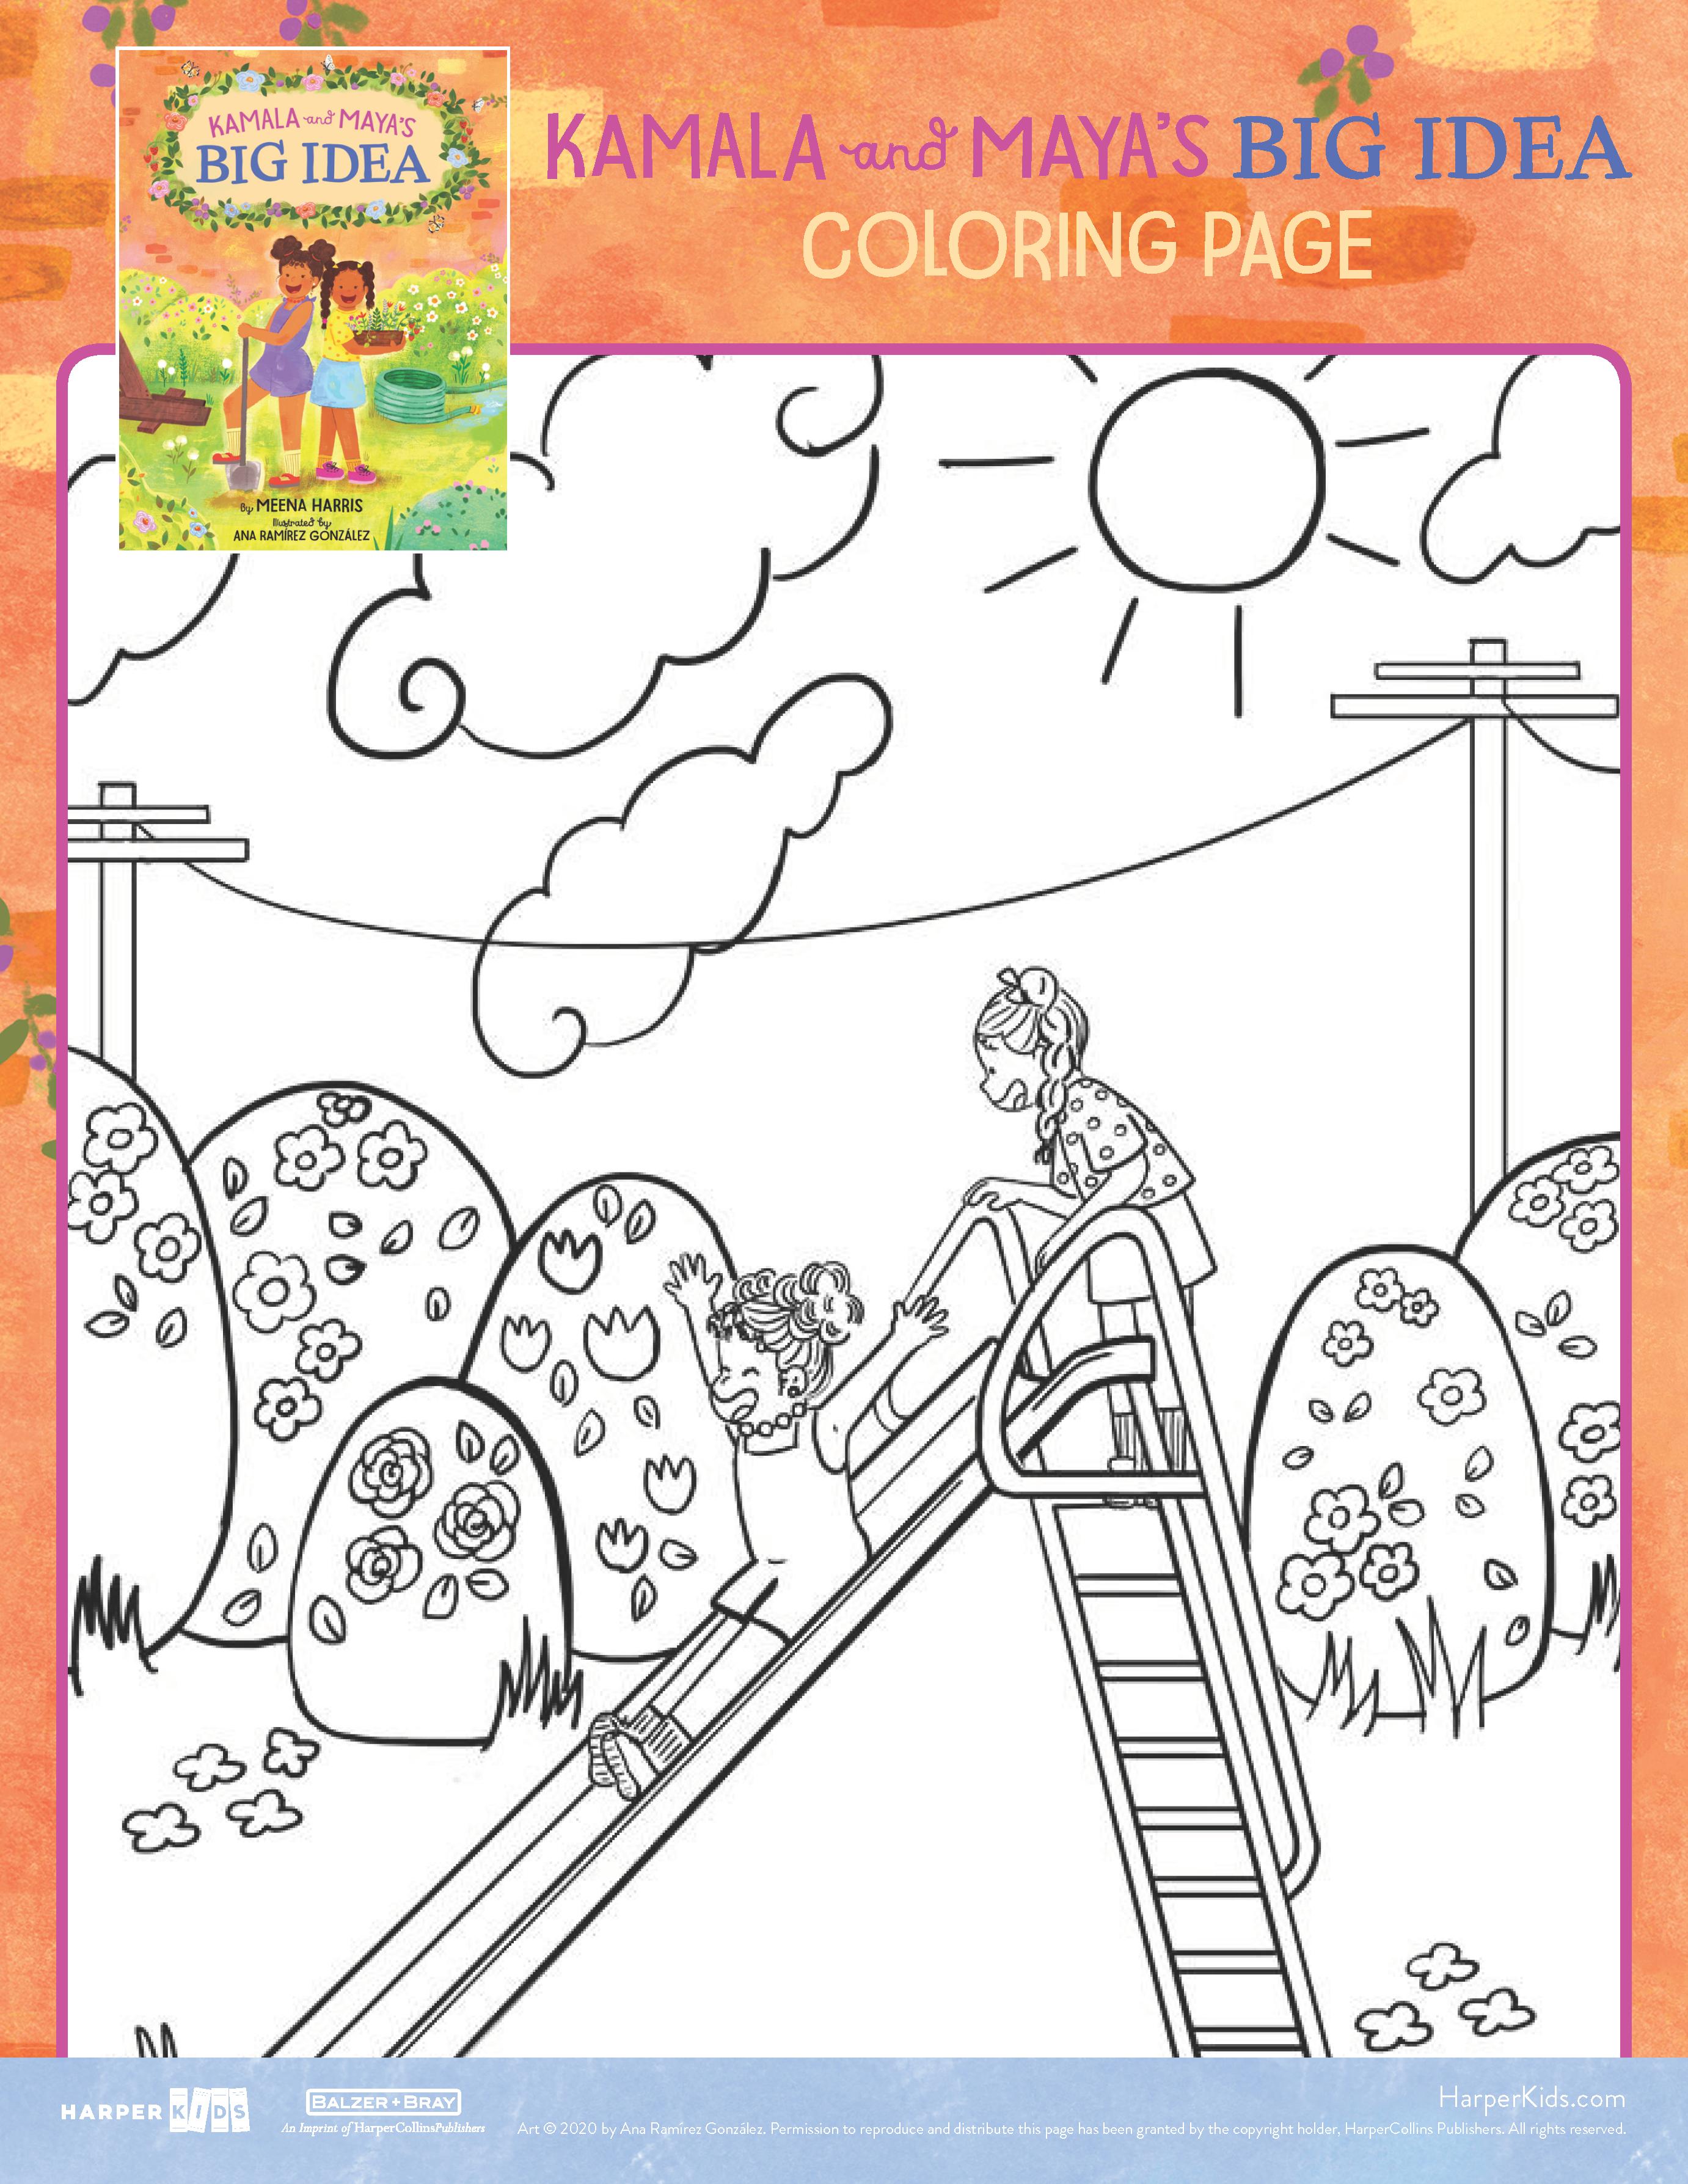 Coloring Page From Kamala And Maya S Big Idea Big Ideas Learning Diy Activities Printable Activities